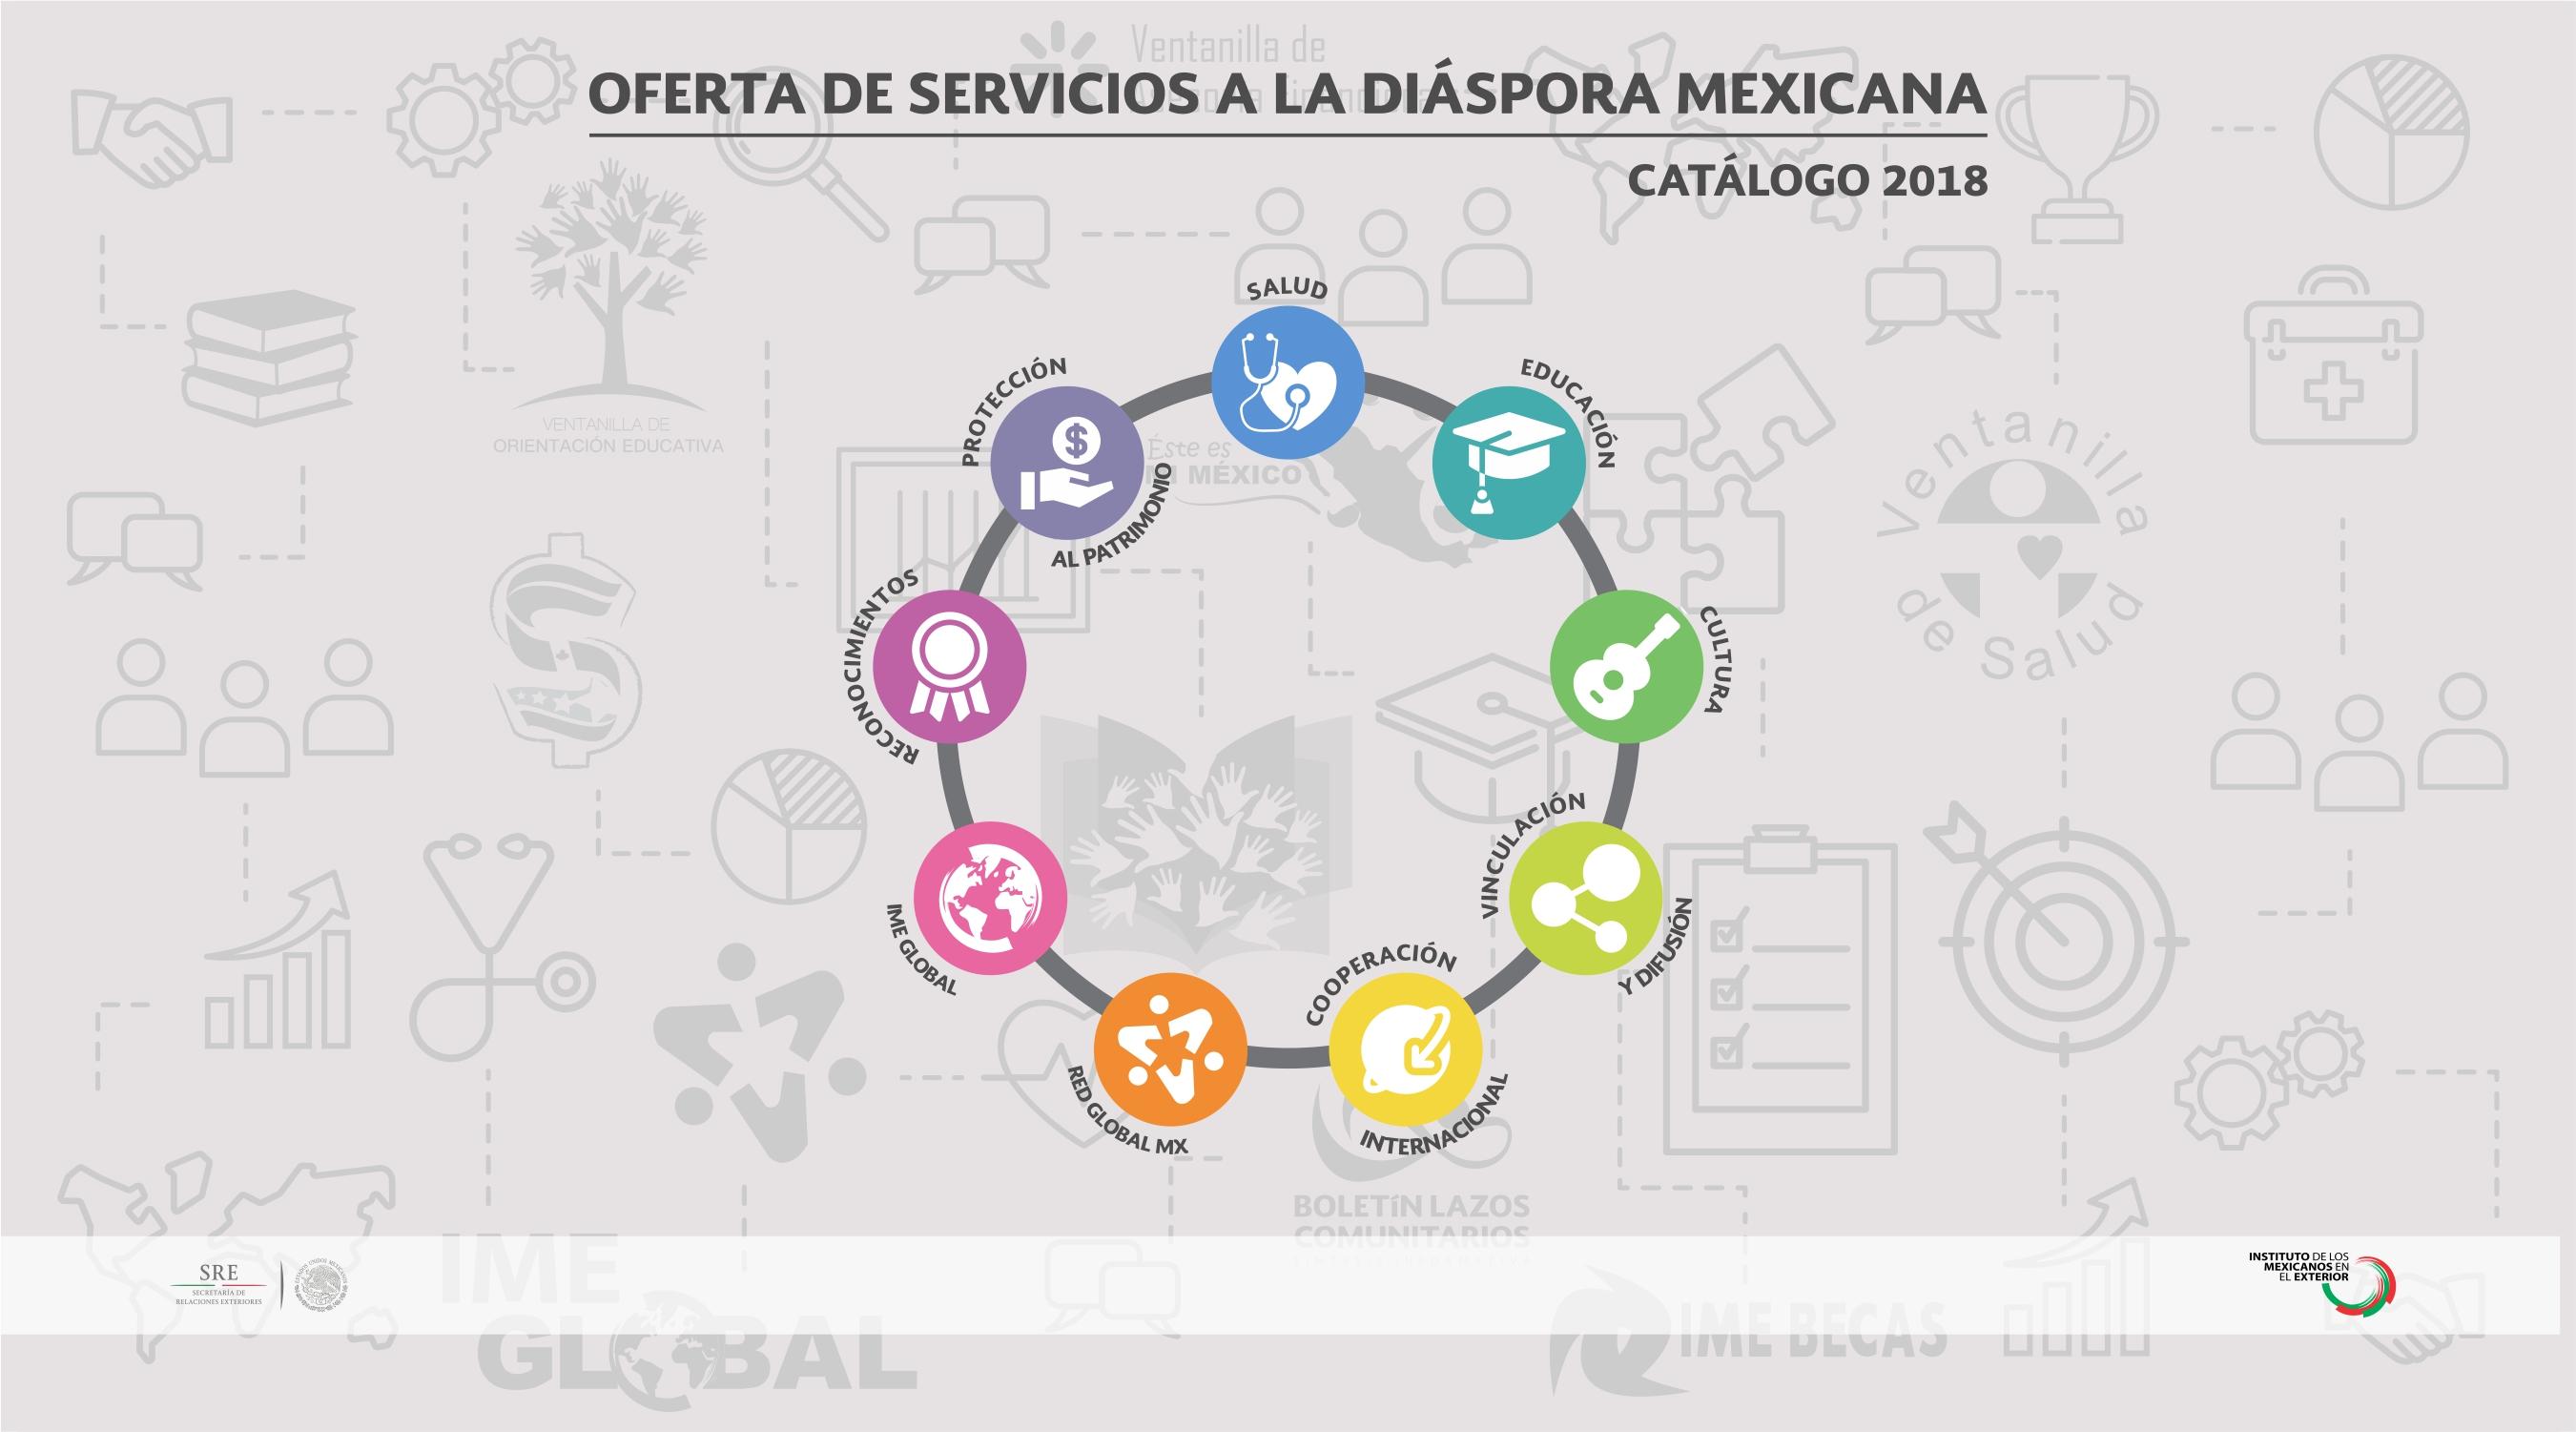 Catálogo 2018. Oferta de Servicios a la Diáspora mexicana